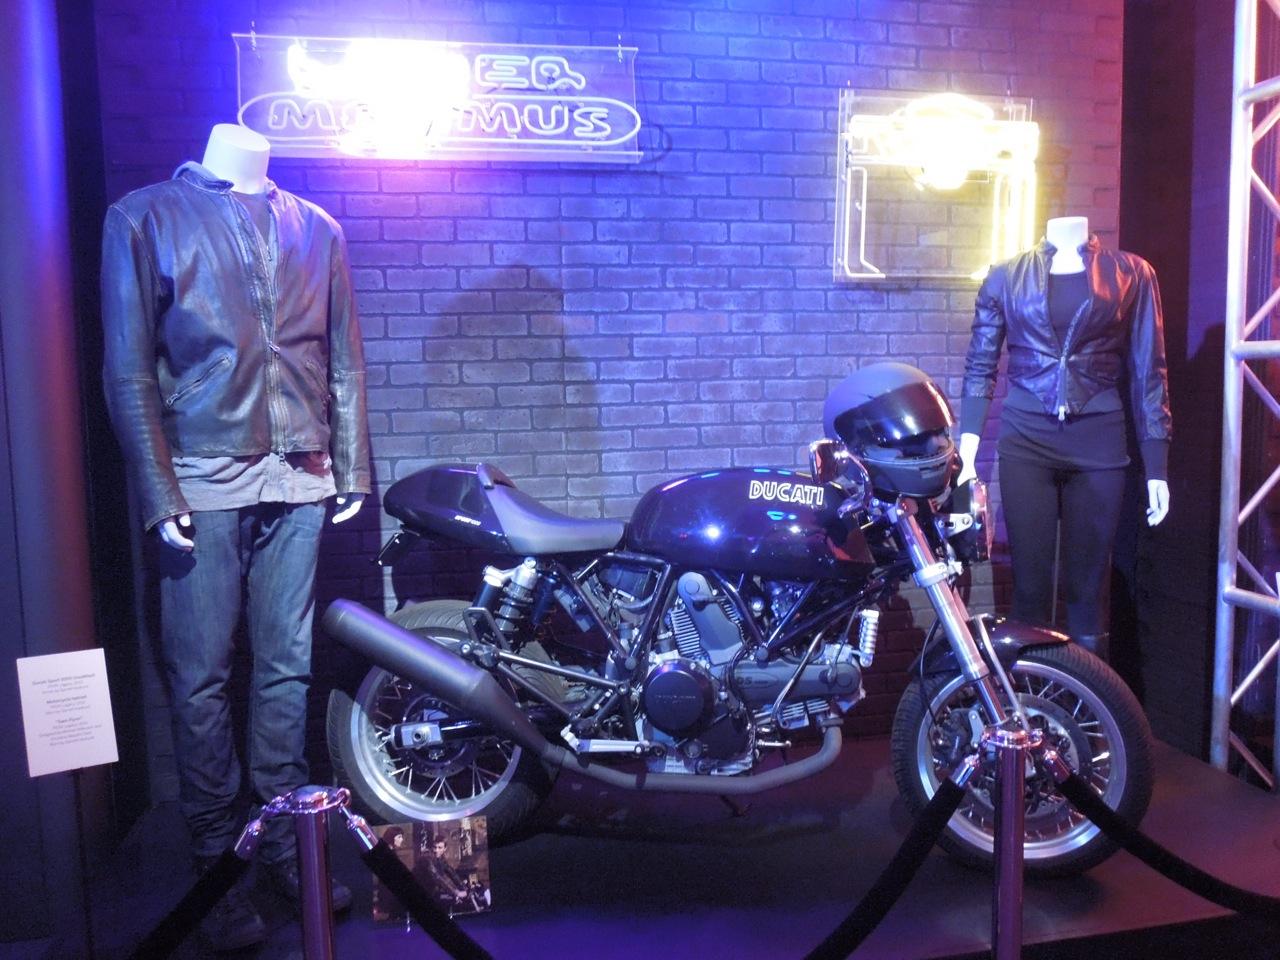 Garrett Hedlund Tron Motorcycle Hollywood Movie Costum...